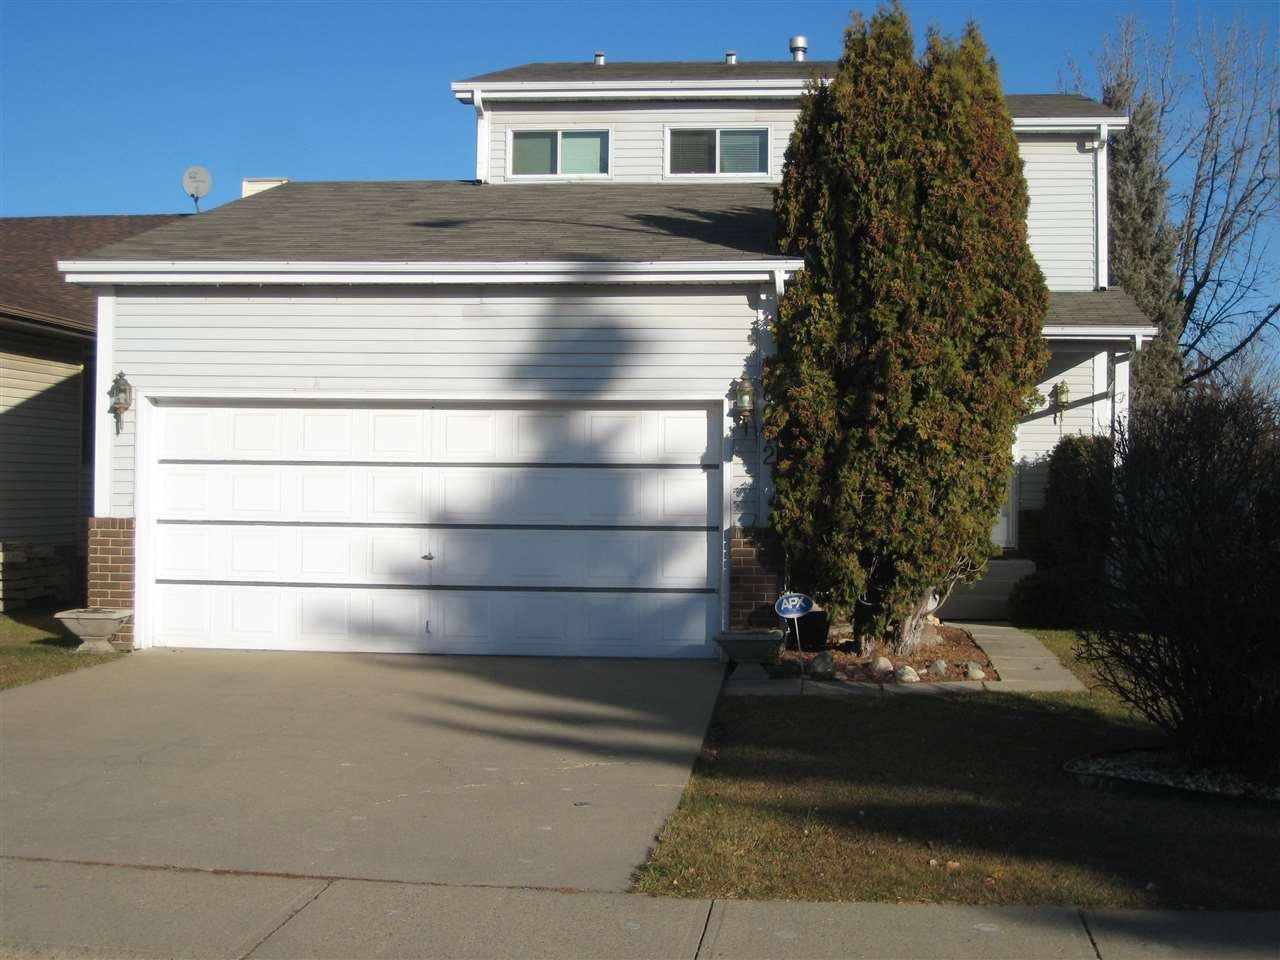 Main Photo: 18912 86A Avenue in Edmonton: Zone 20 House for sale : MLS®# E4167882